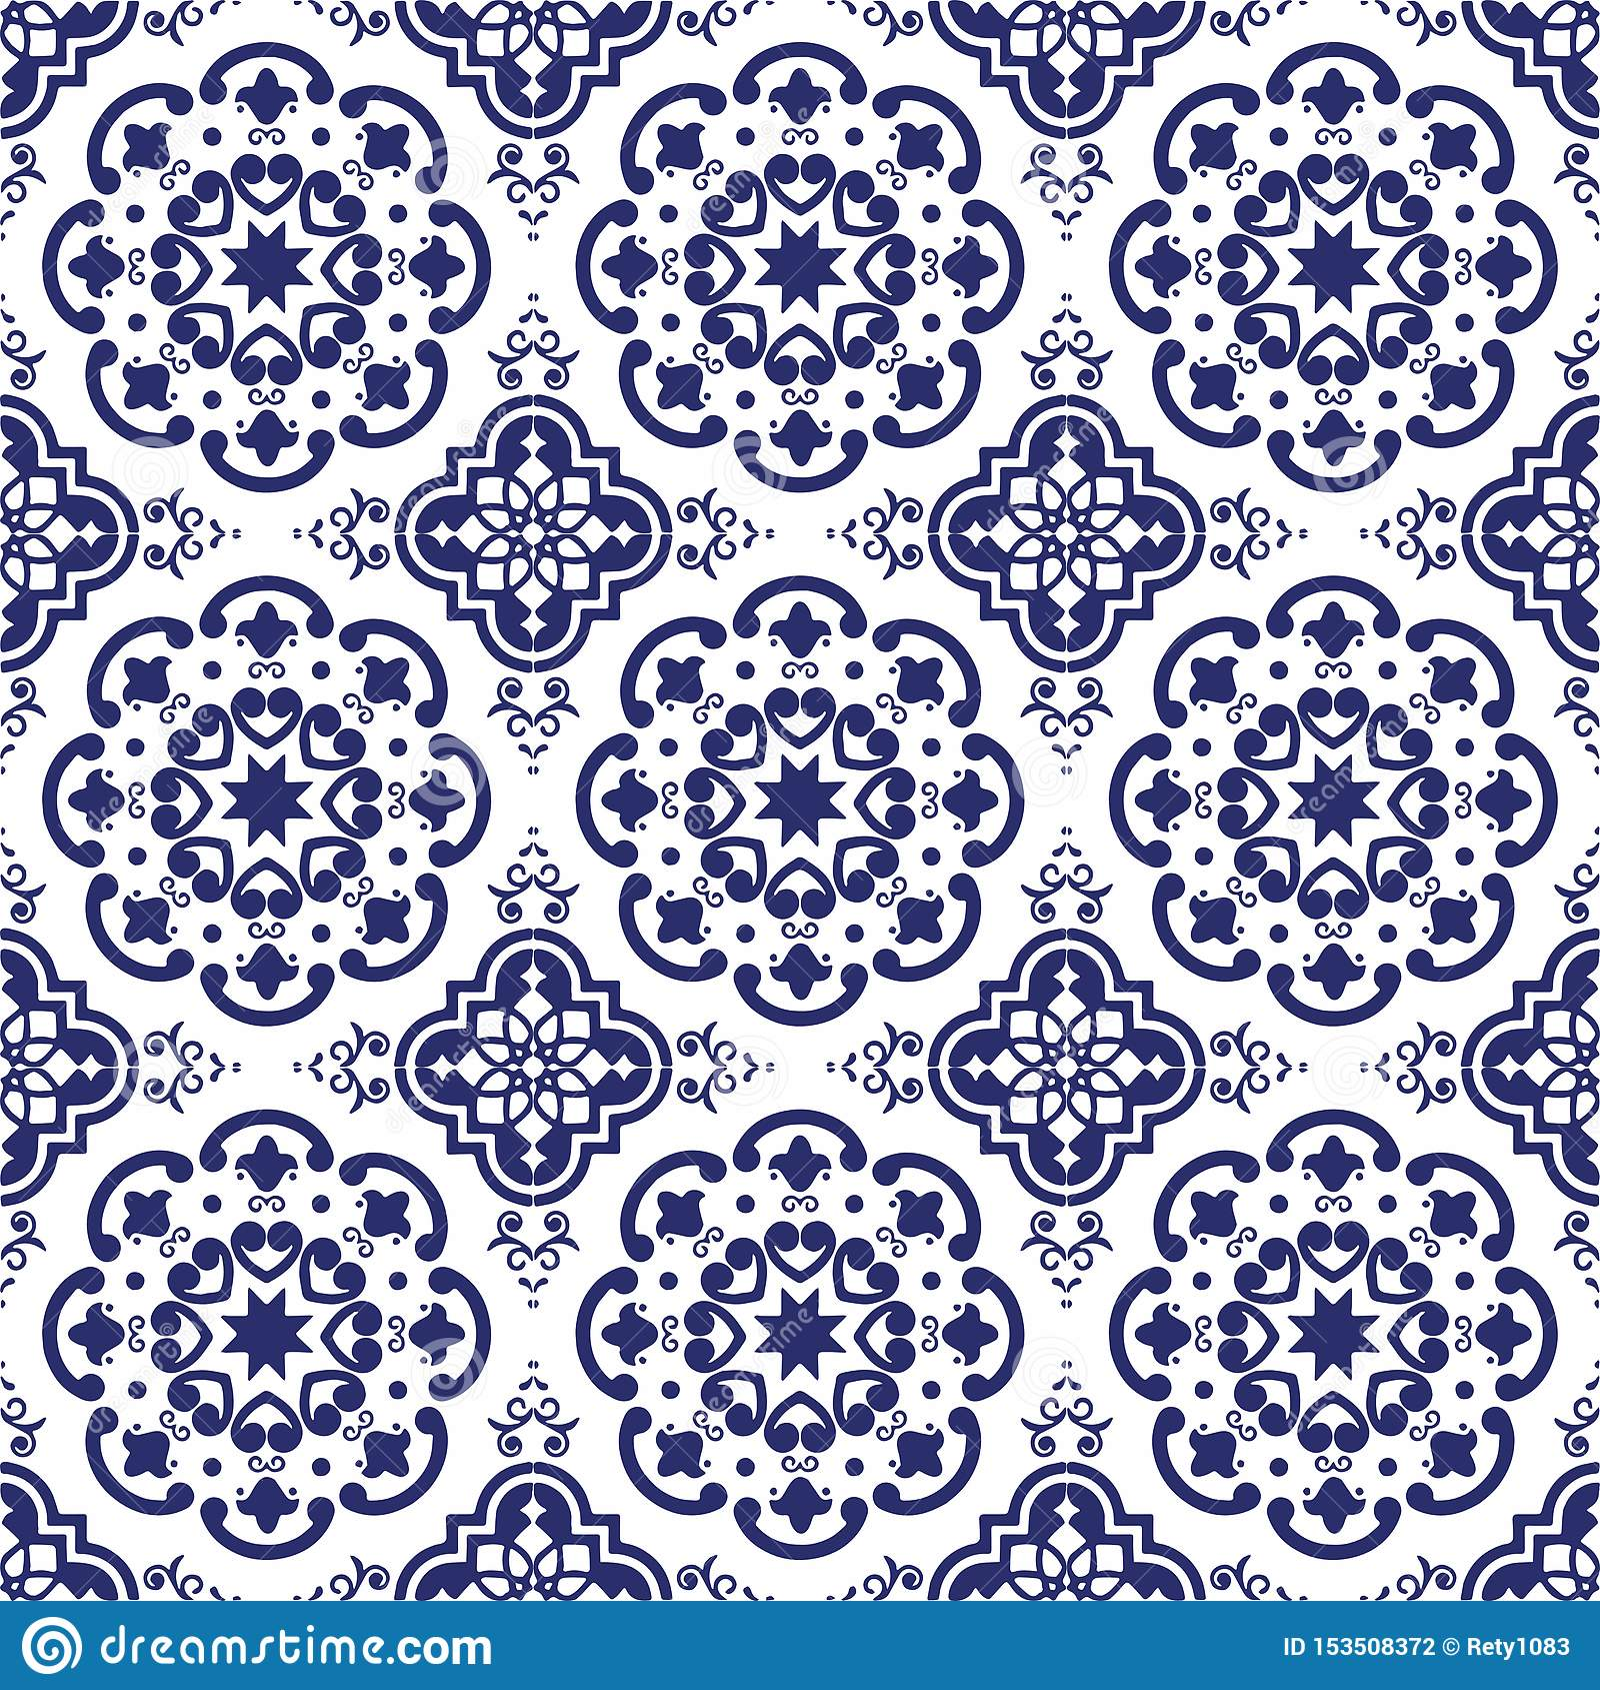 https www dreamstime com ceramic tile portuguese tiles blue white moroccan tiles blue white kitchen tiles bathroom tiles surface pattern vector image153508372